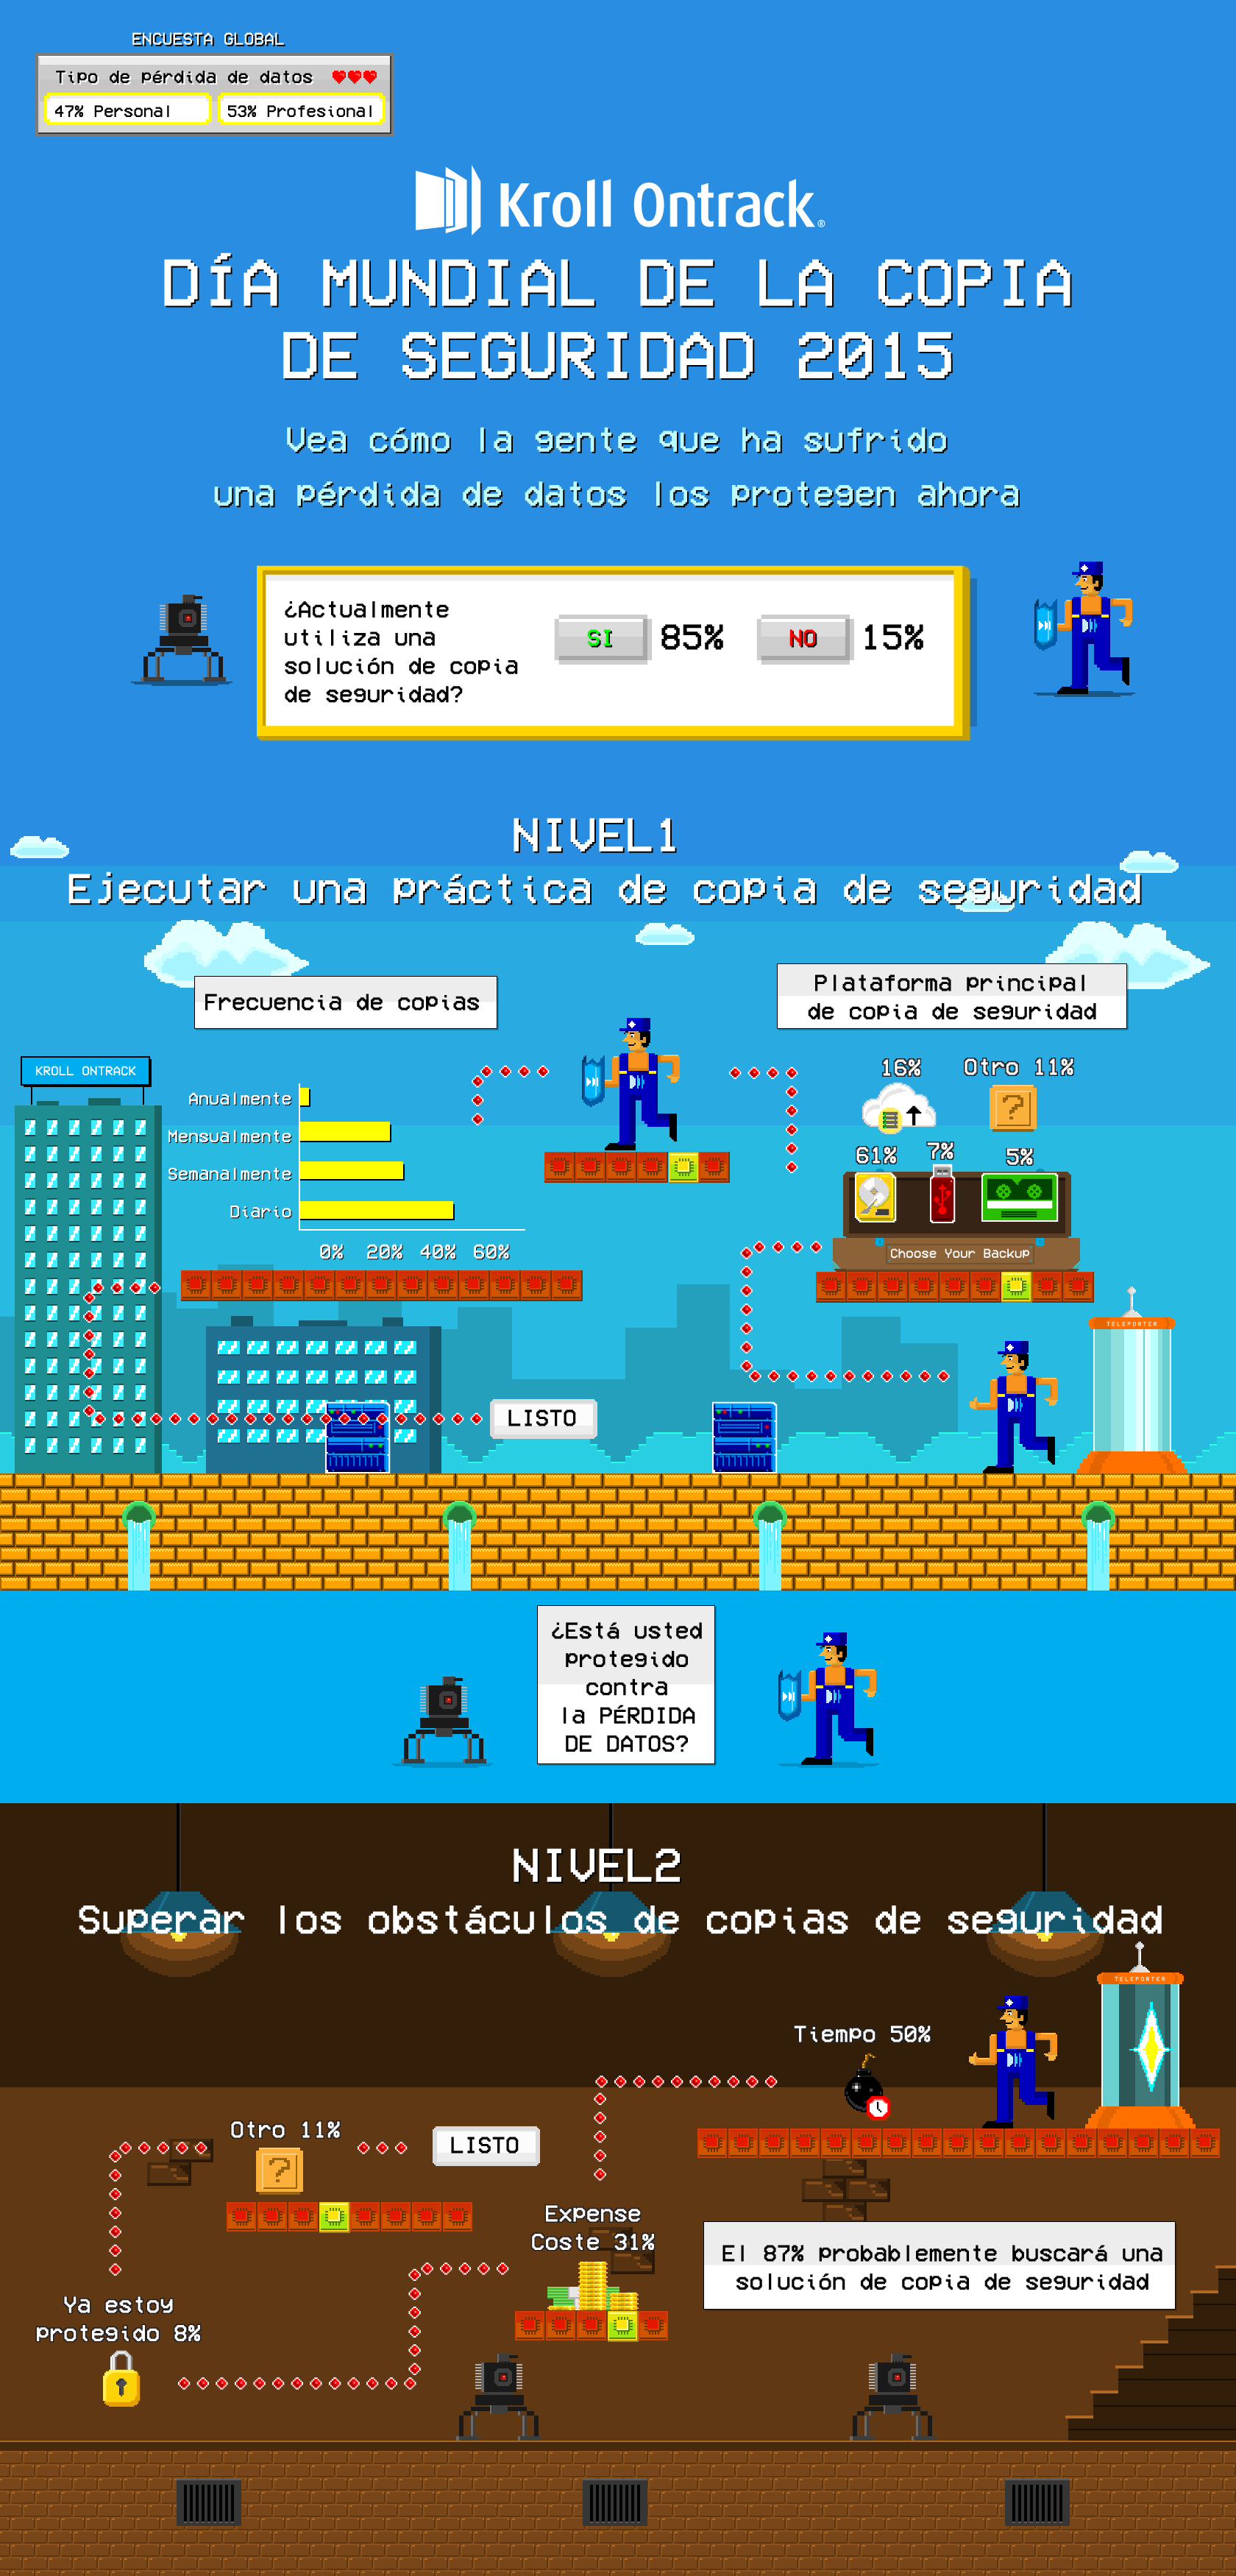 Infografia Dia Mundial de la copia de seguridad